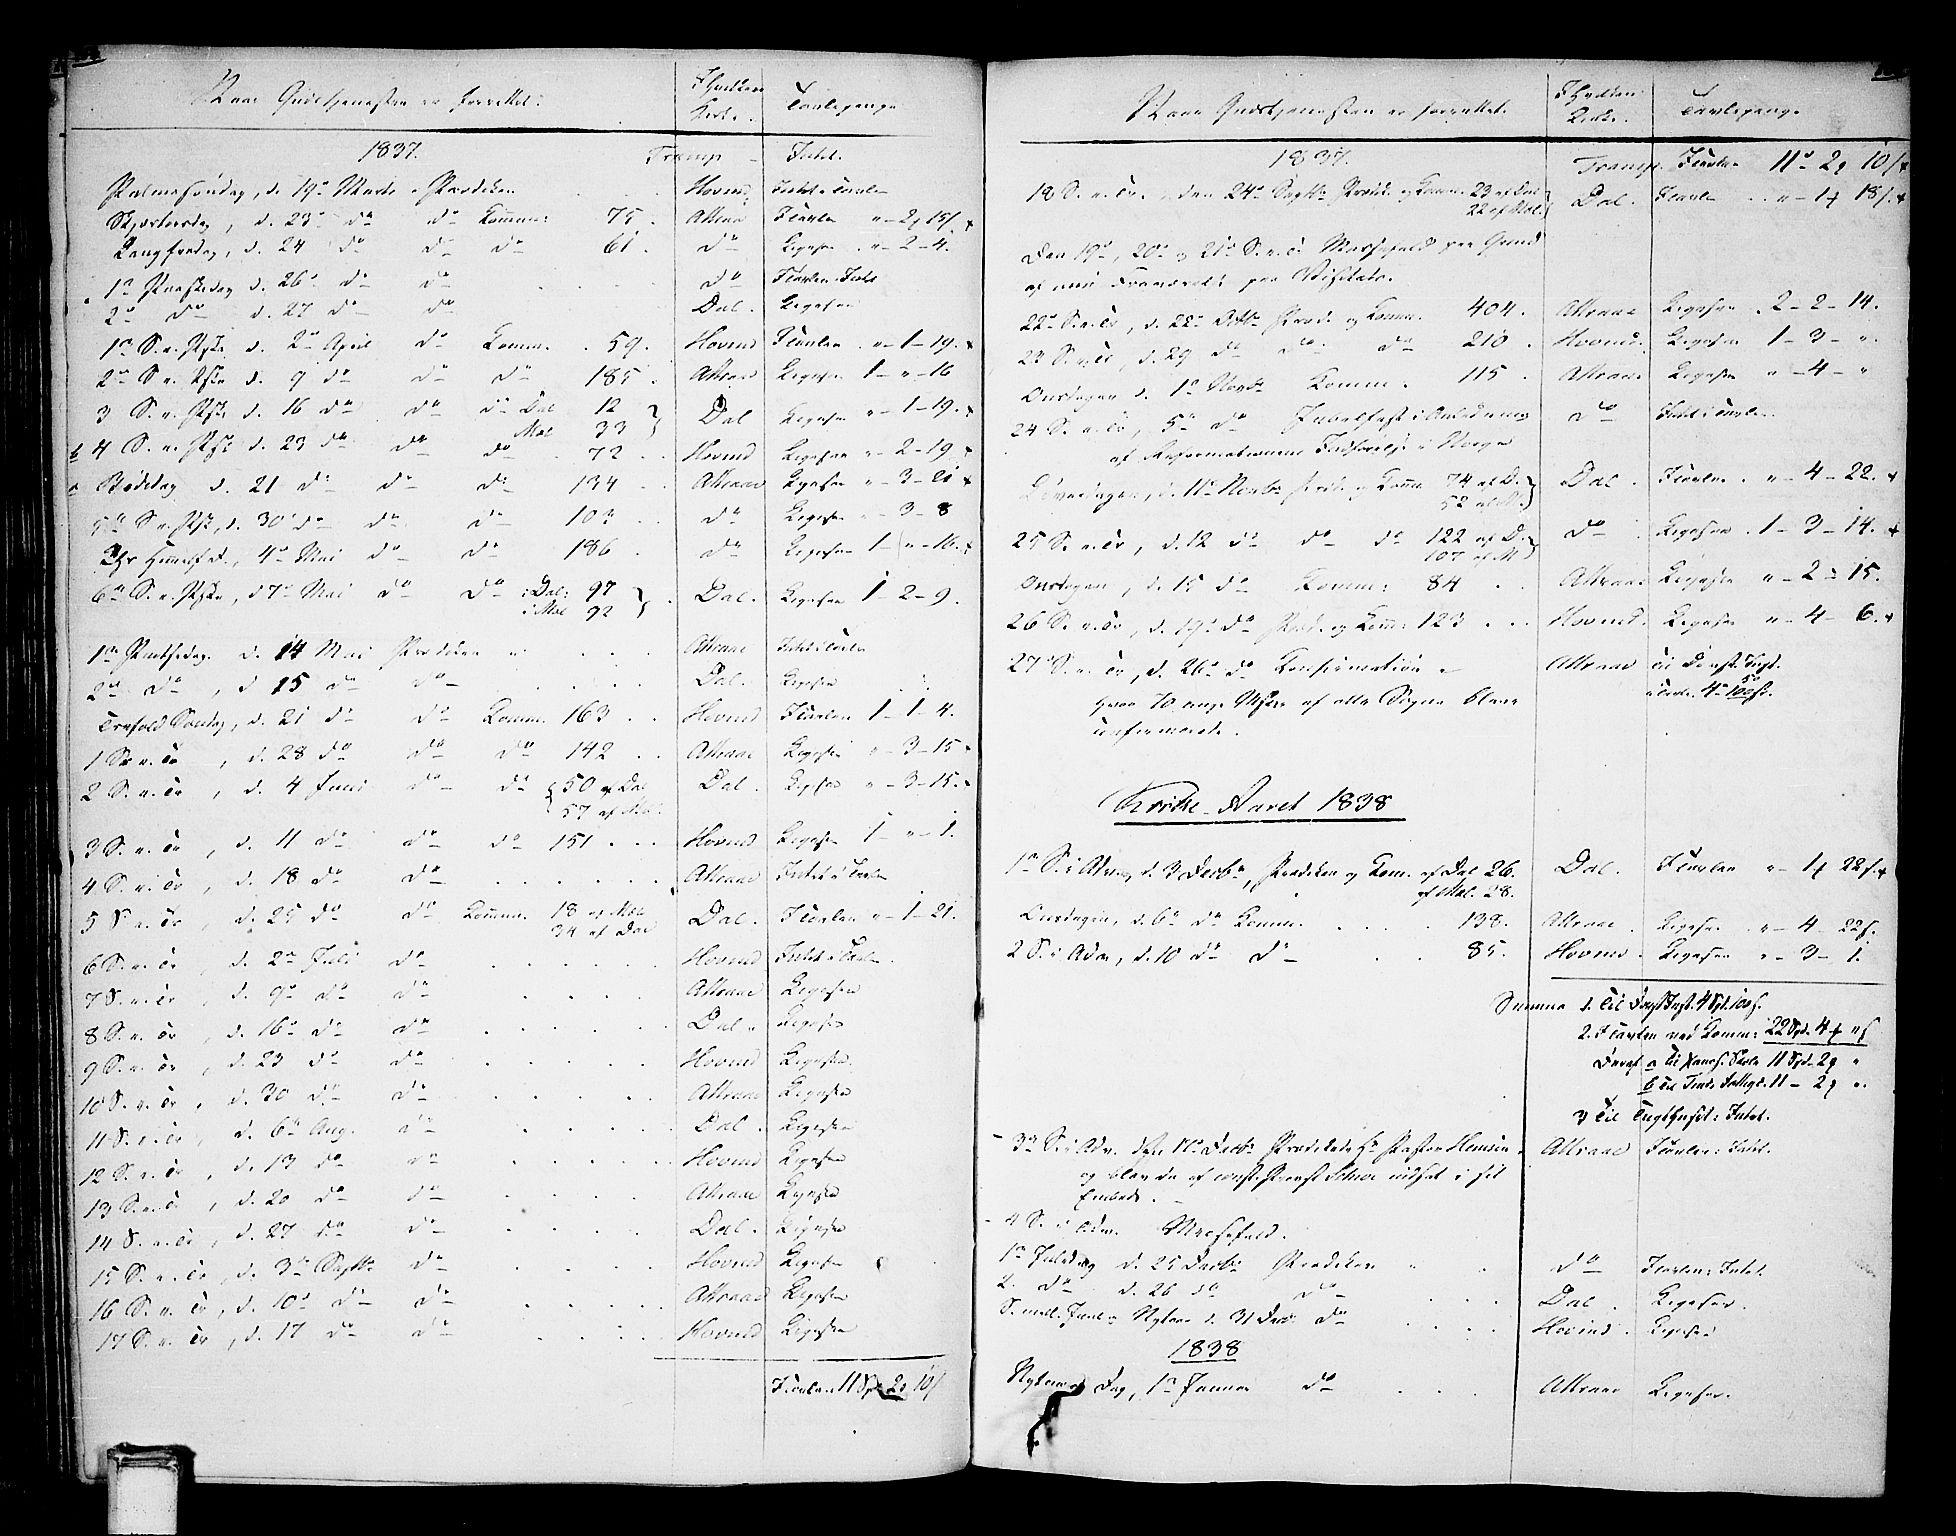 SAKO, Tinn kirkebøker, F/Fa/L0003: Ministerialbok nr. I 3, 1810-1814, s. 164-165